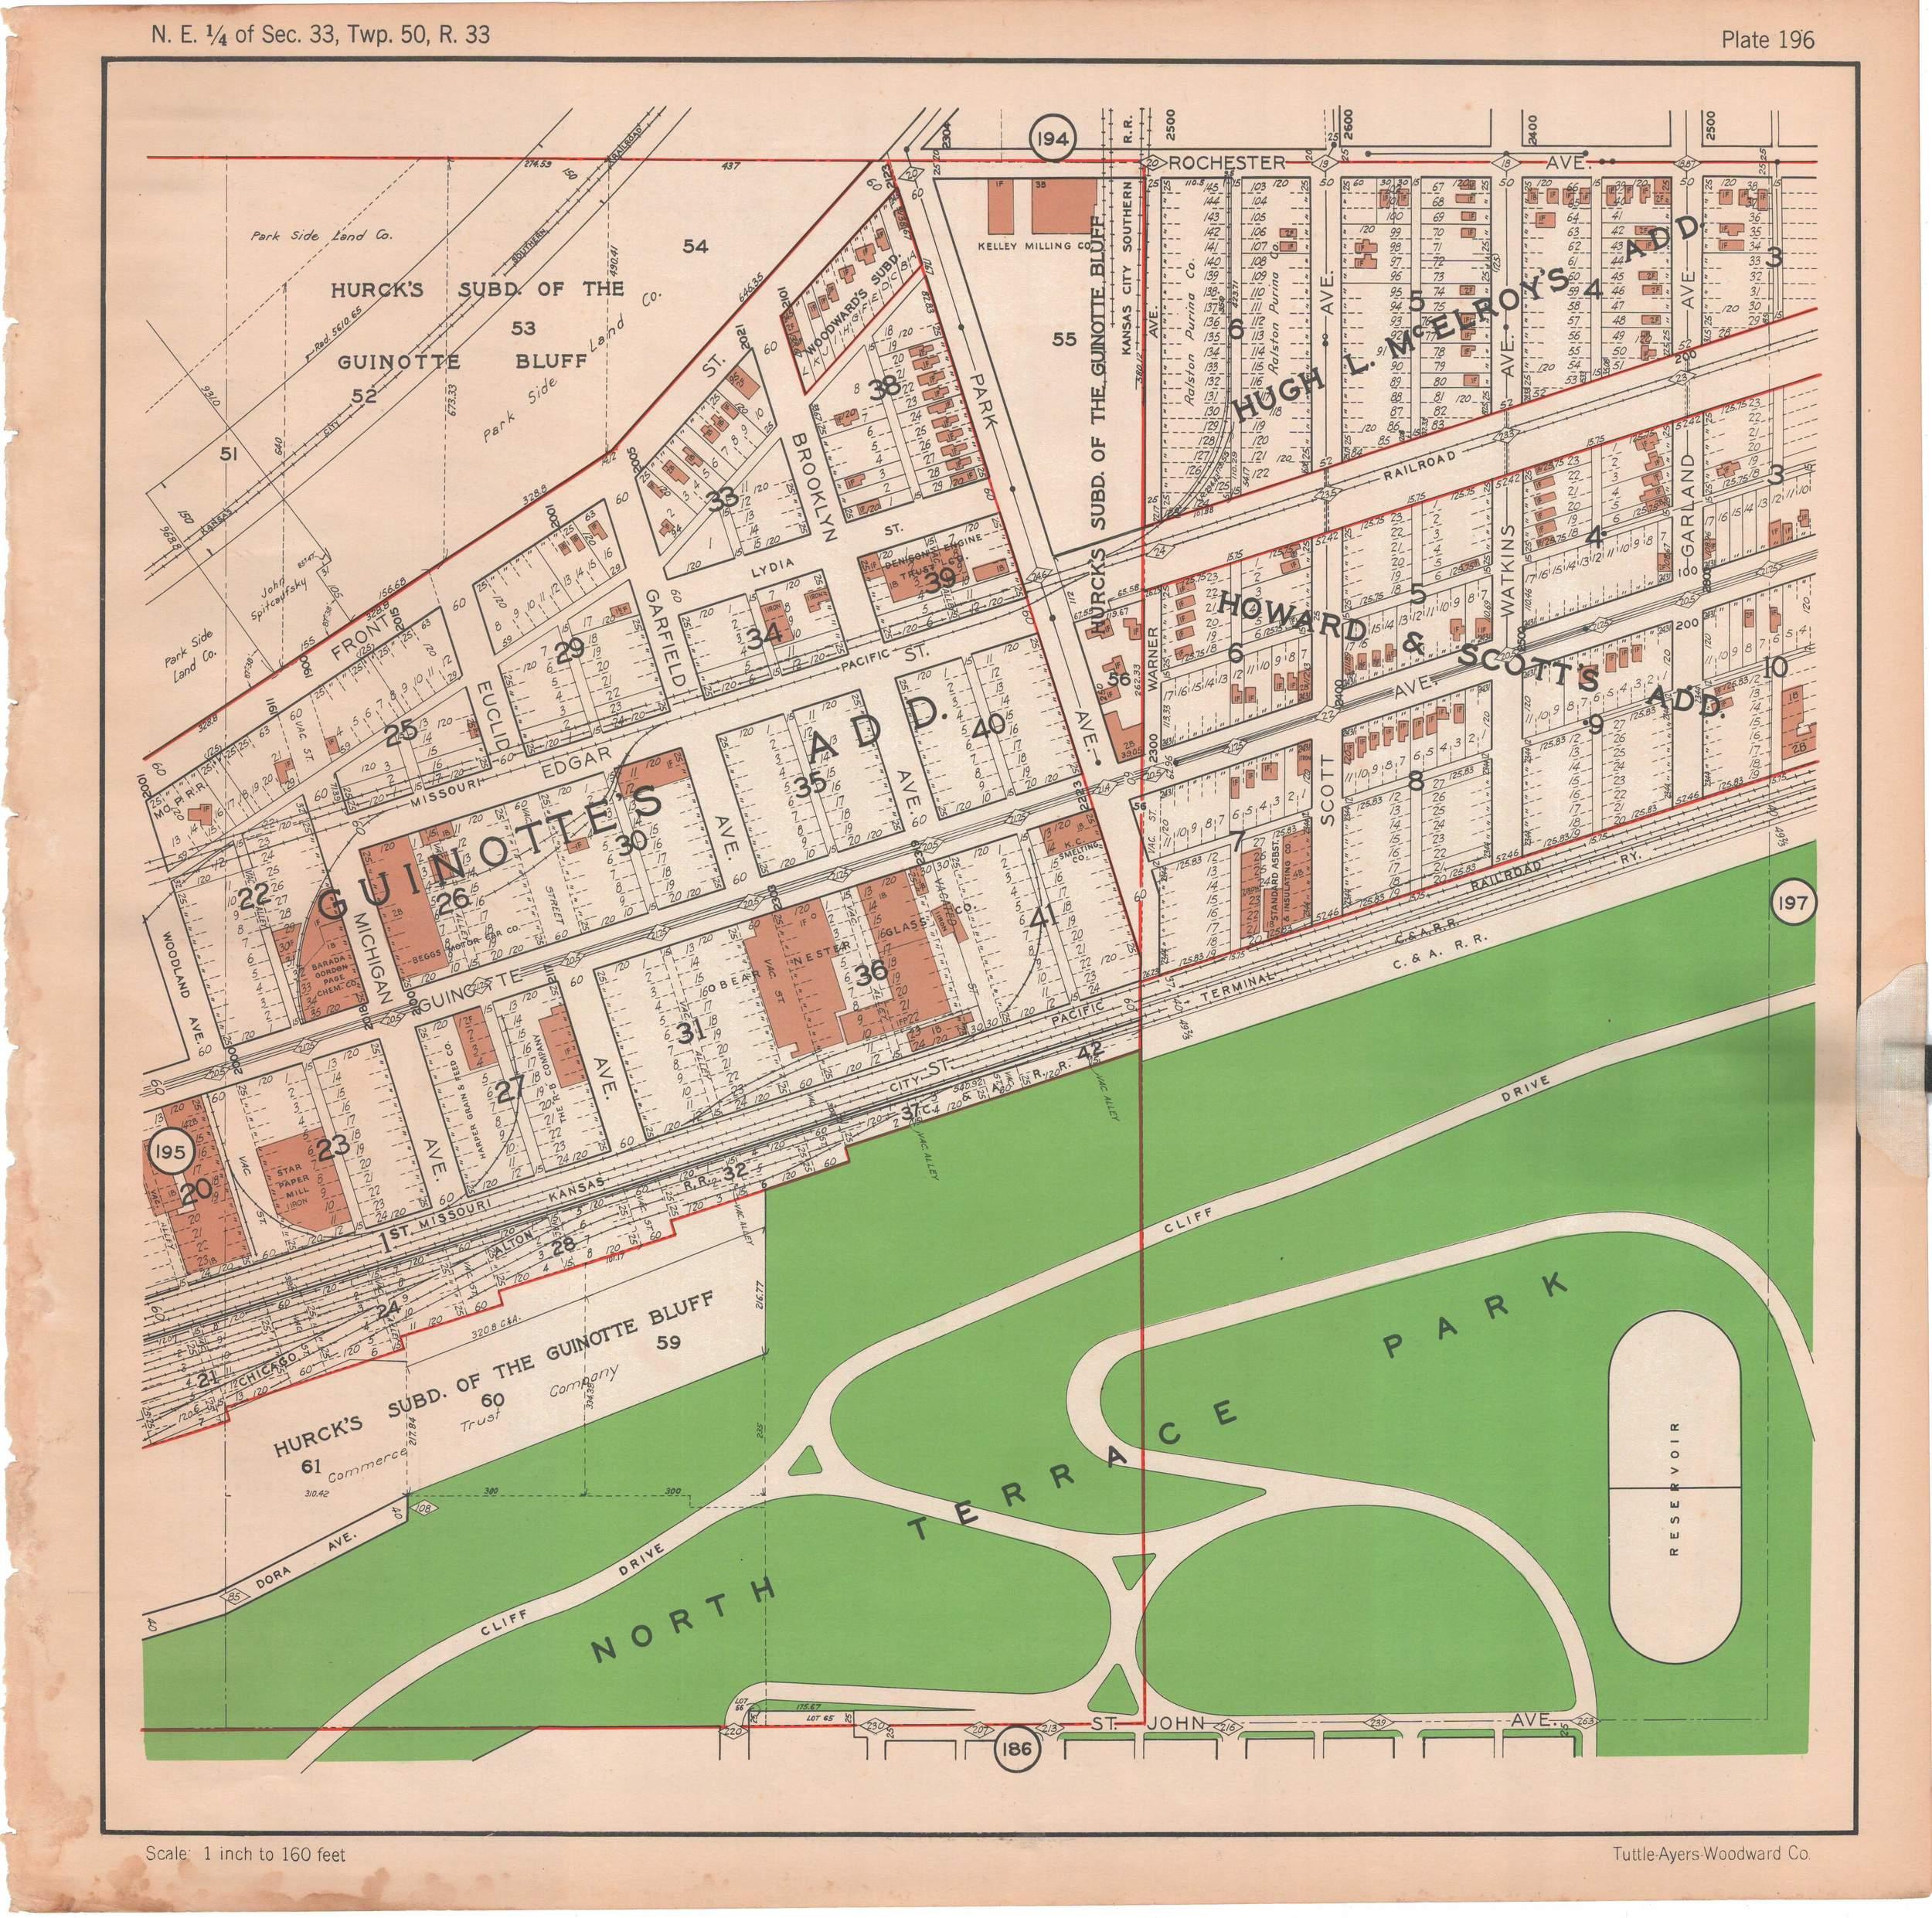 1925 TUTTLE_AYERS_Plate_196.JPG